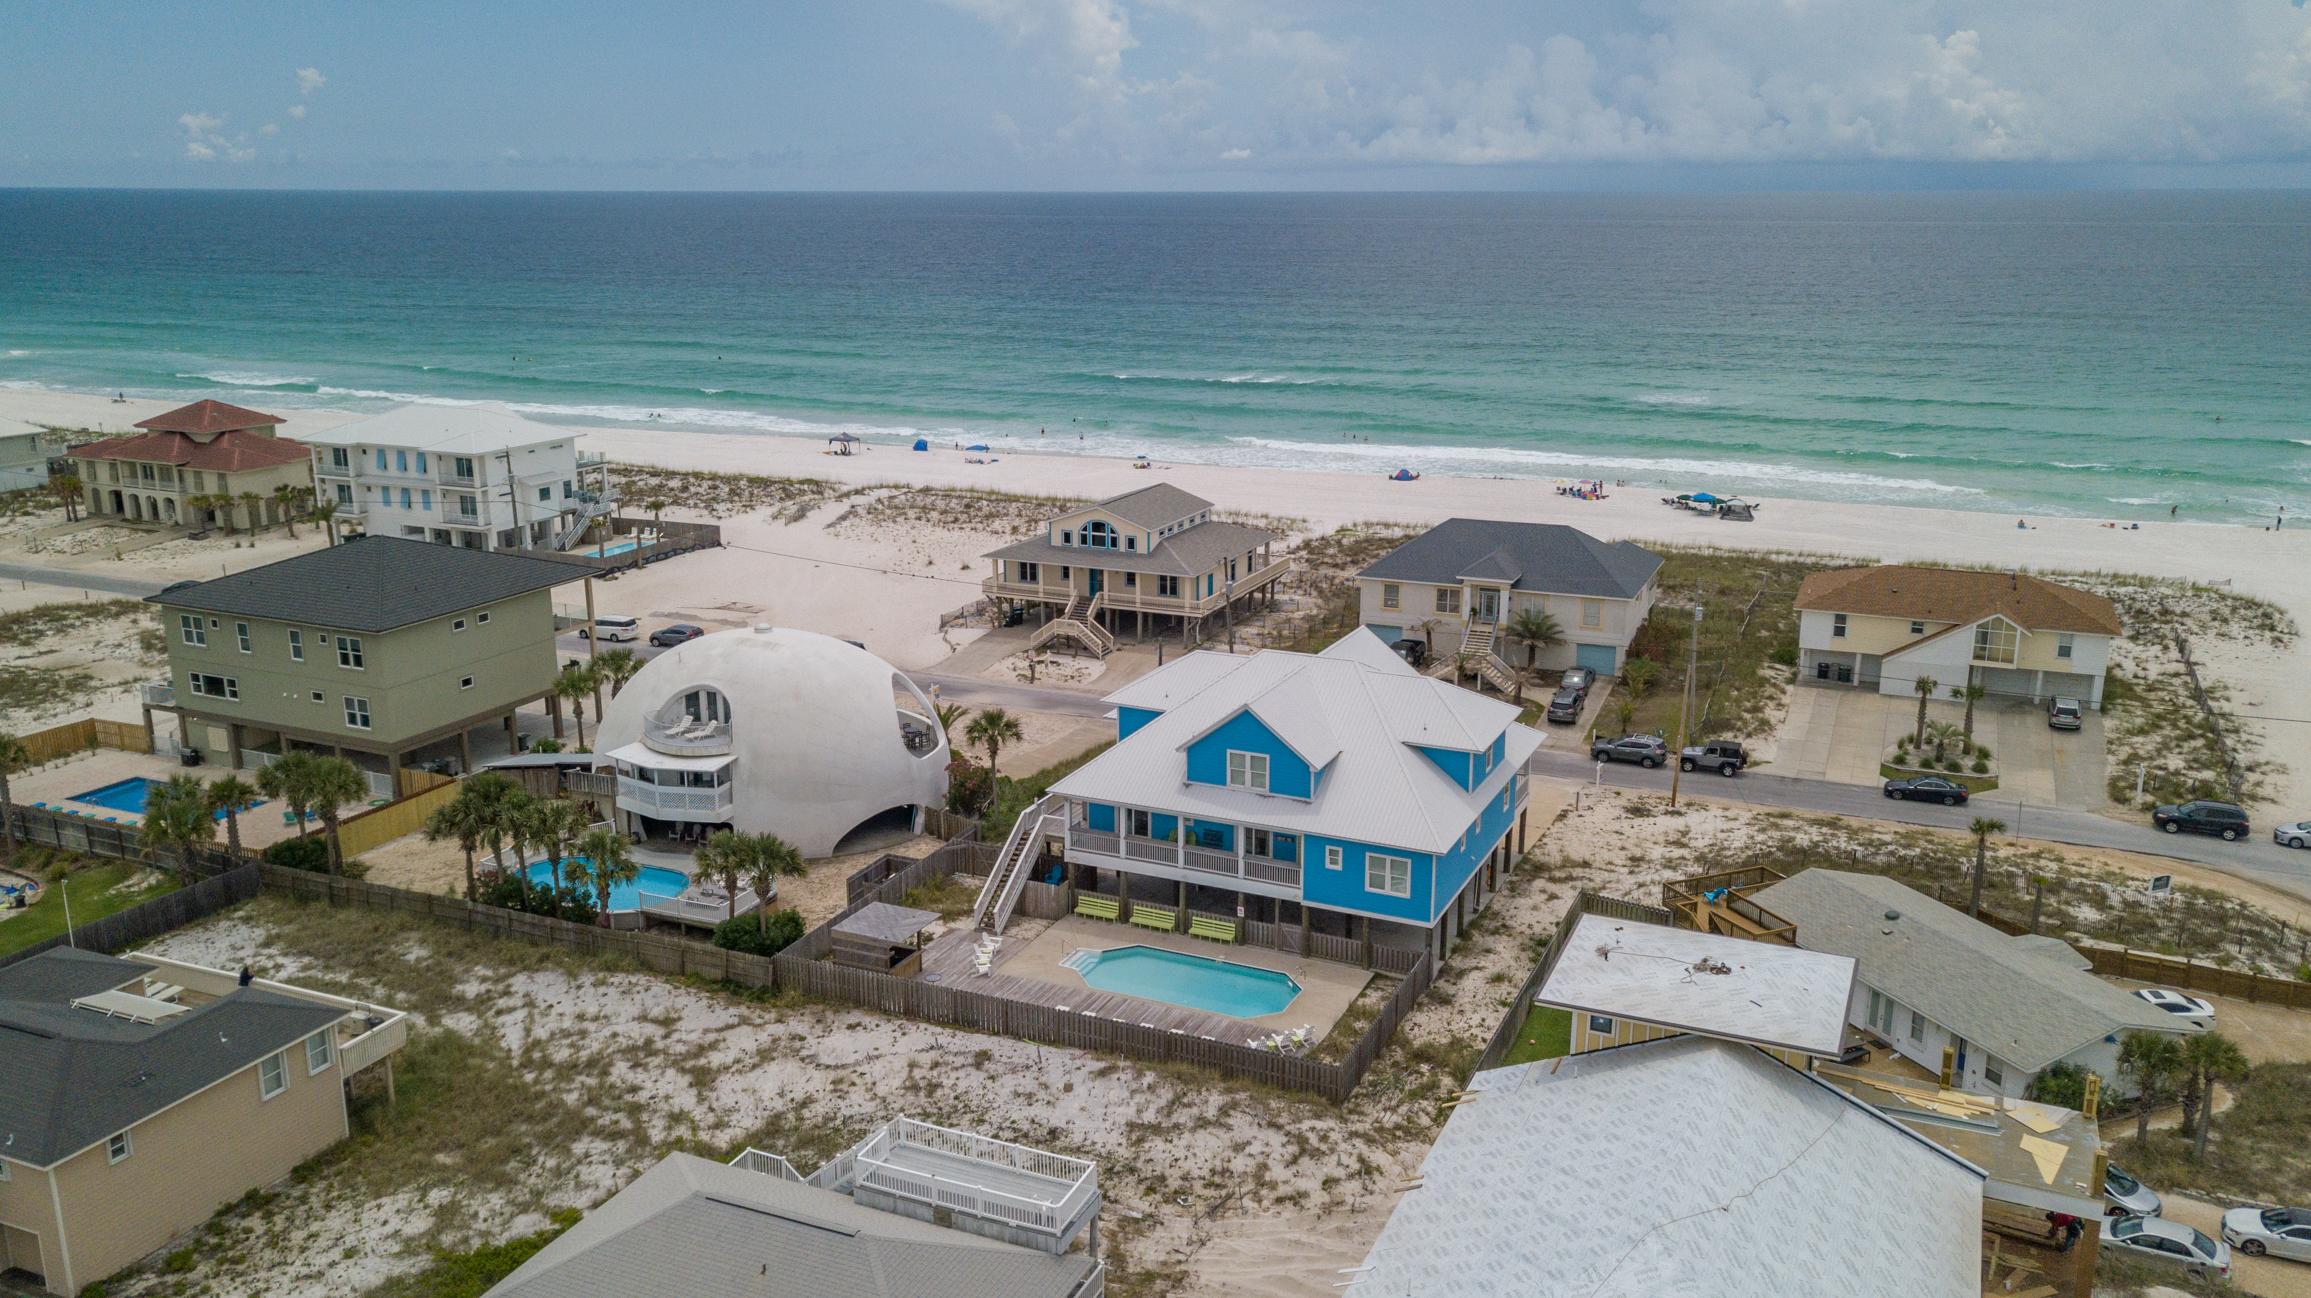 Ariola 1003 - The Starfish House House/Cottage rental in Pensacola Beach House Rentals in Pensacola Beach Florida - #69